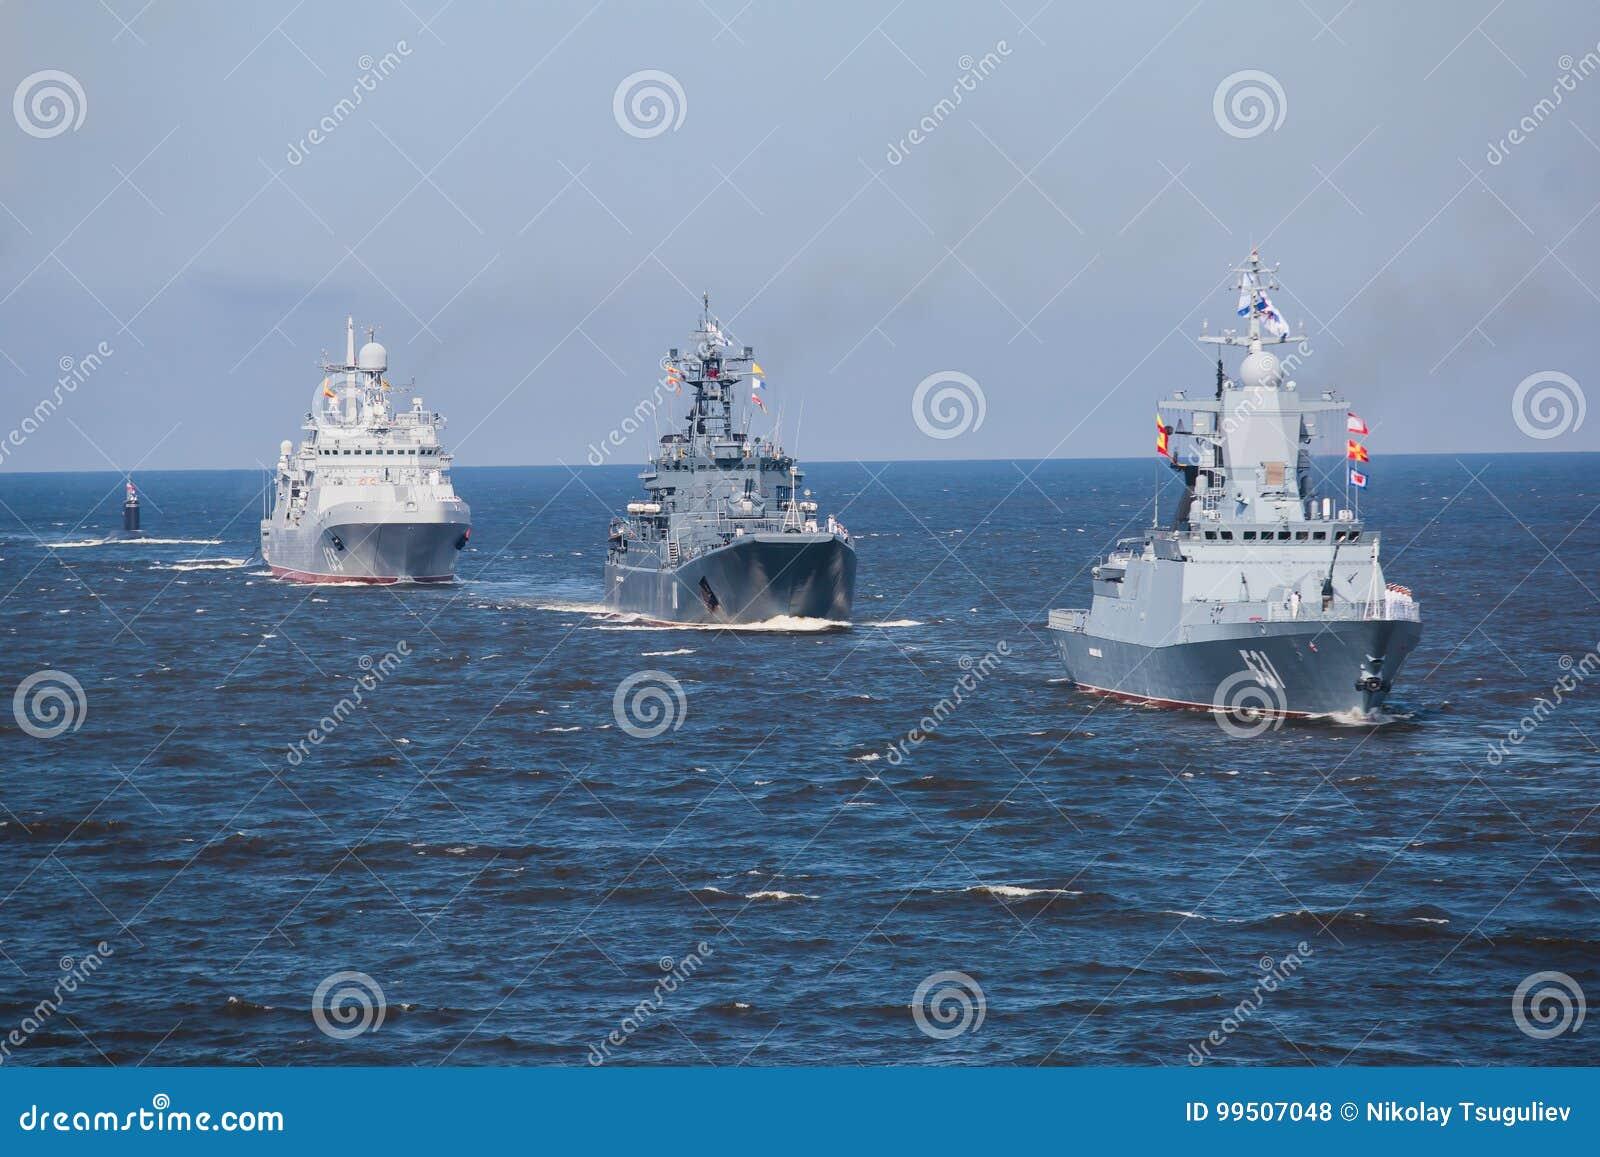 Northern Fleet of Russia. Ships of the Northern Fleet 4